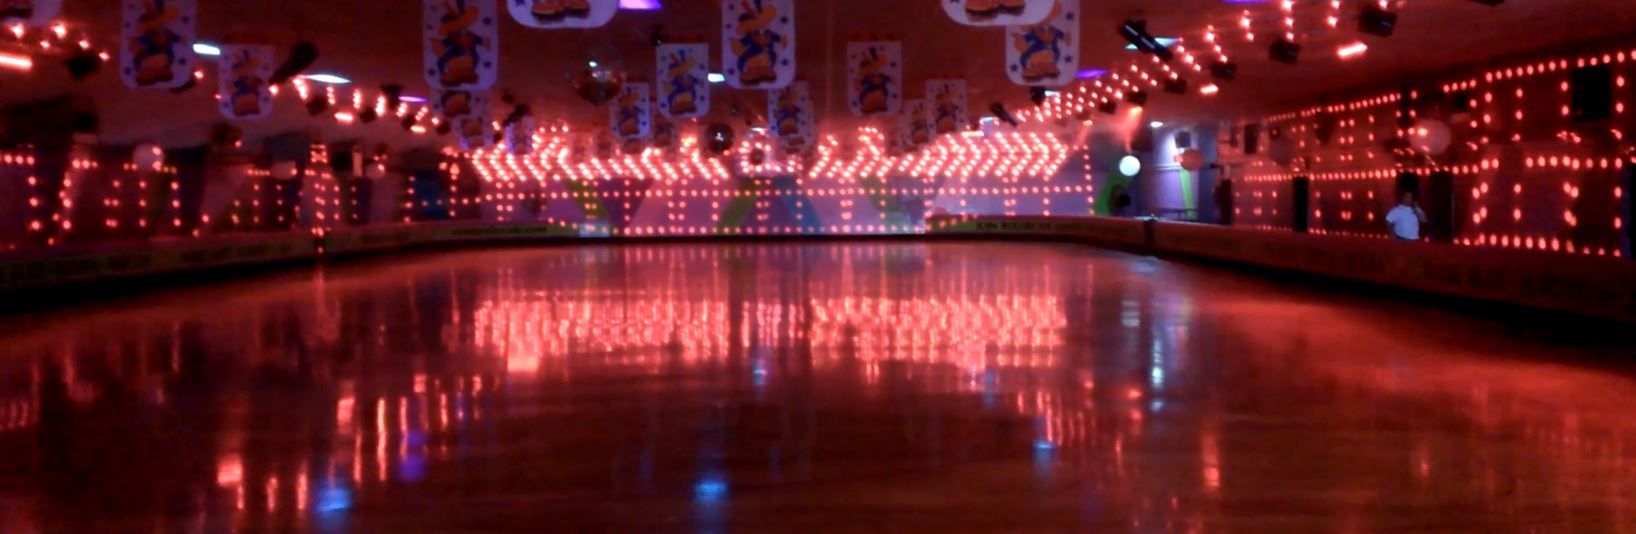 Rollercade 1 Alamo Sound And Light